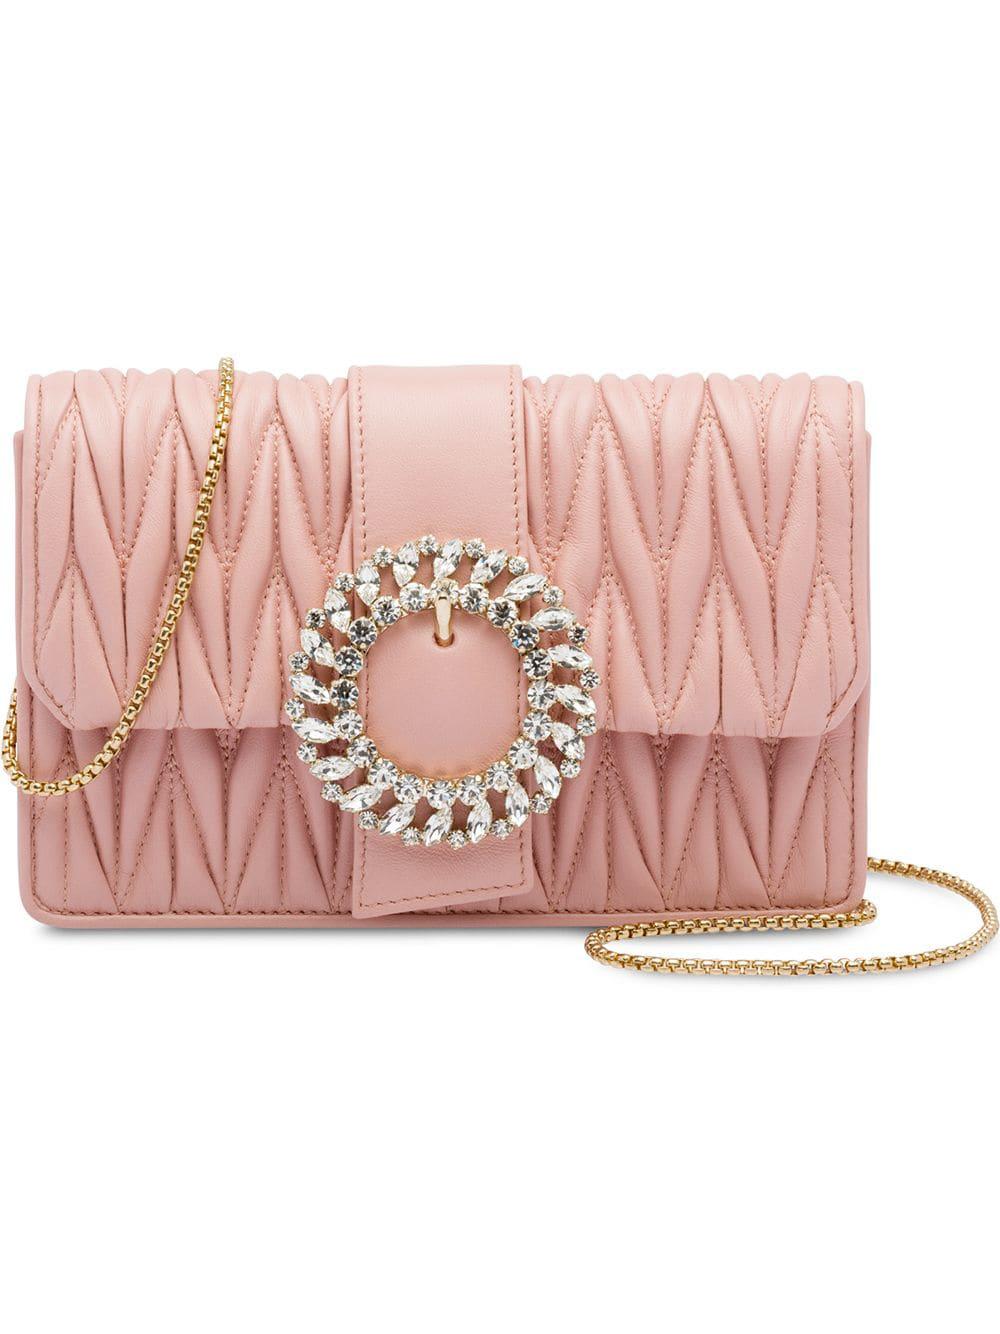 cb21dada28e3 Miu Miu My Miu Leather Bag - Pink